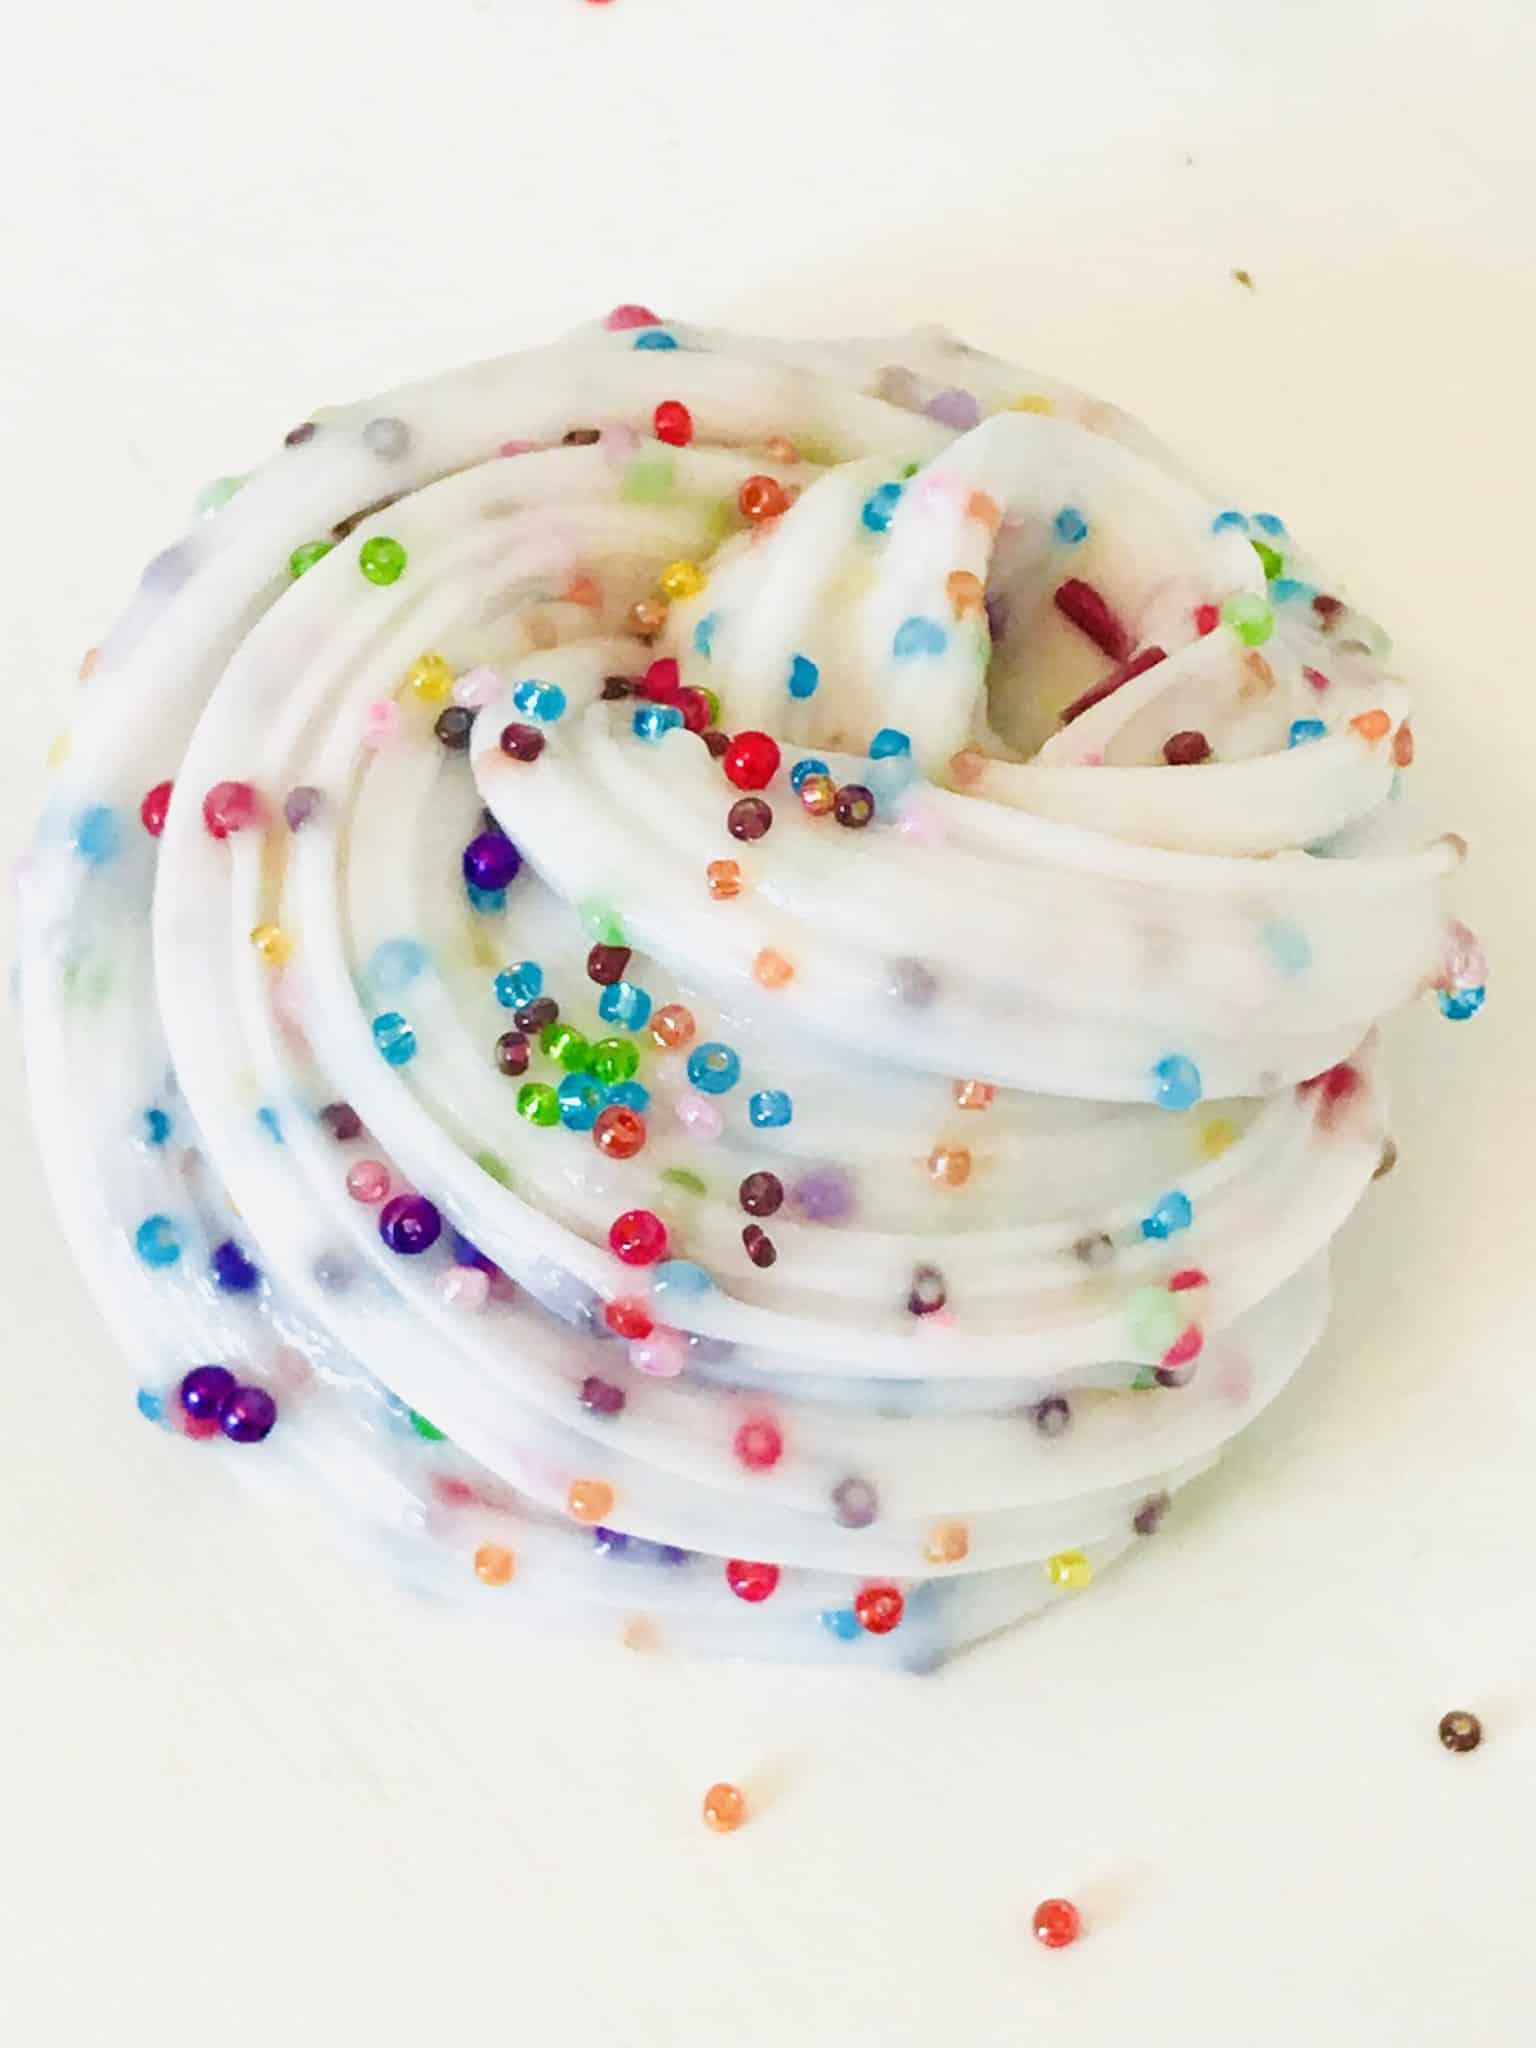 How To Make Vibrant Rainbow Slime #slime #rainbowslime #easyslime